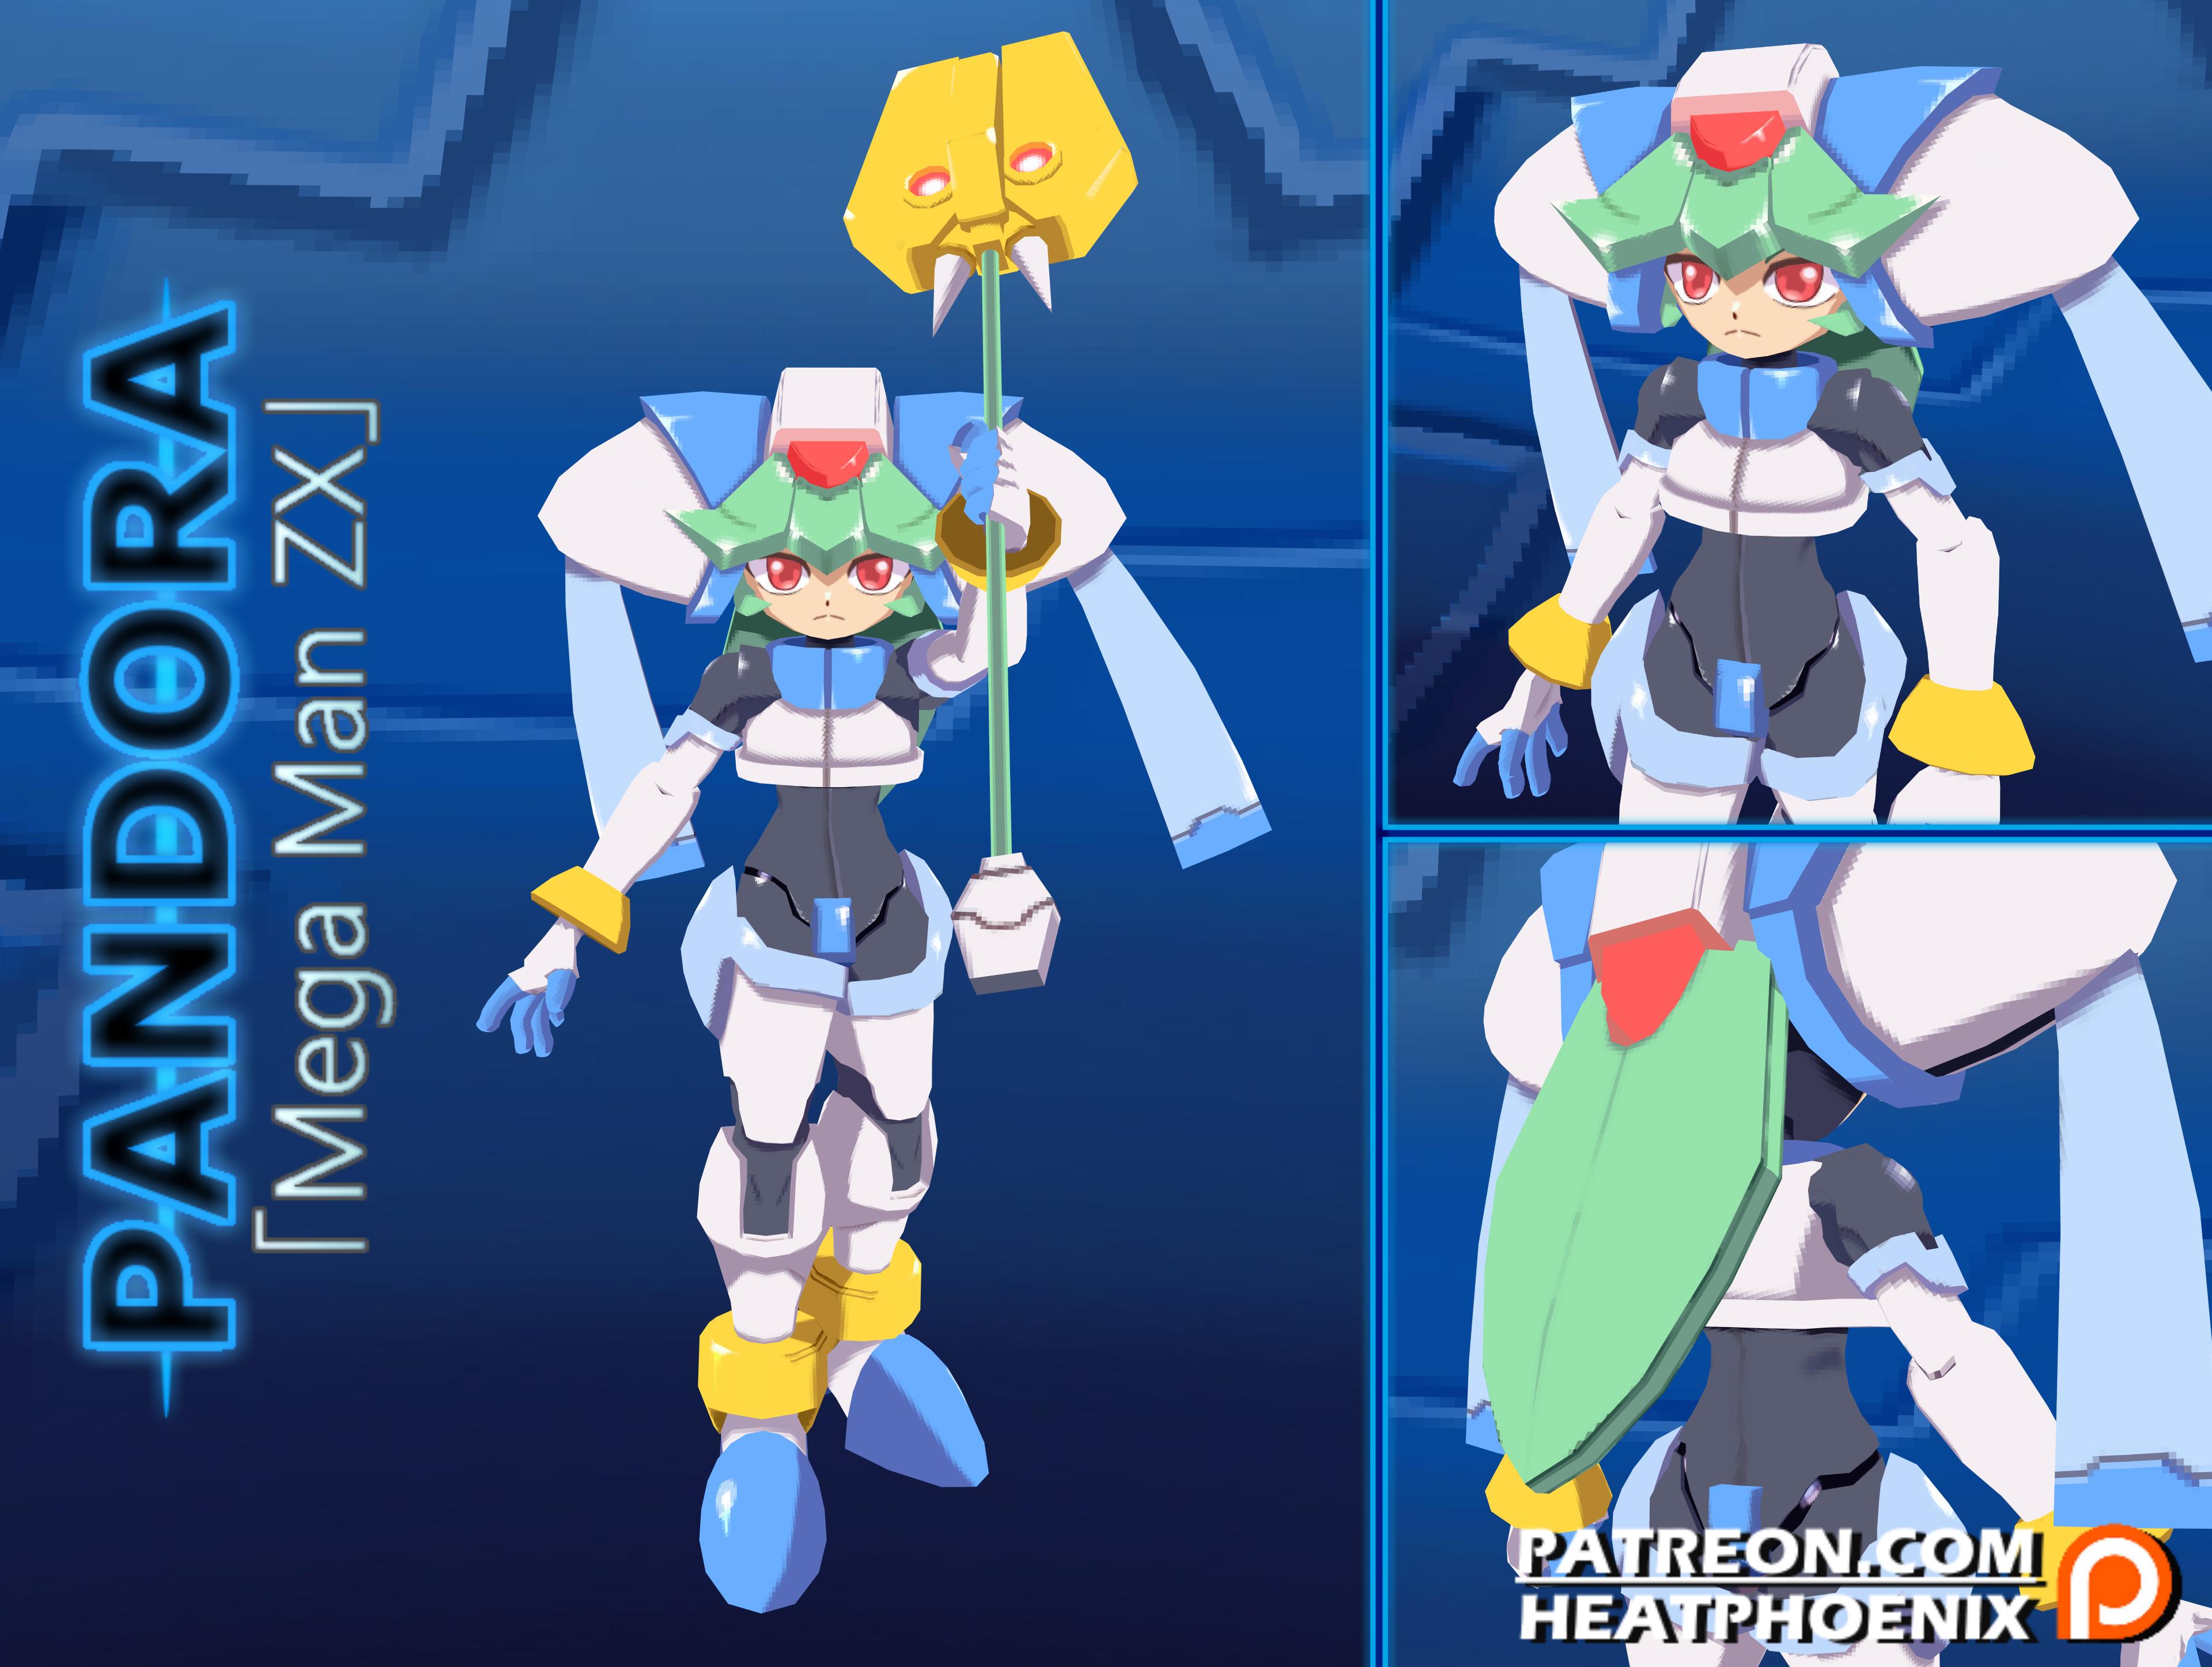 Pandora (Rockman ZX) Image #2468780 - Zerochan Anime Image